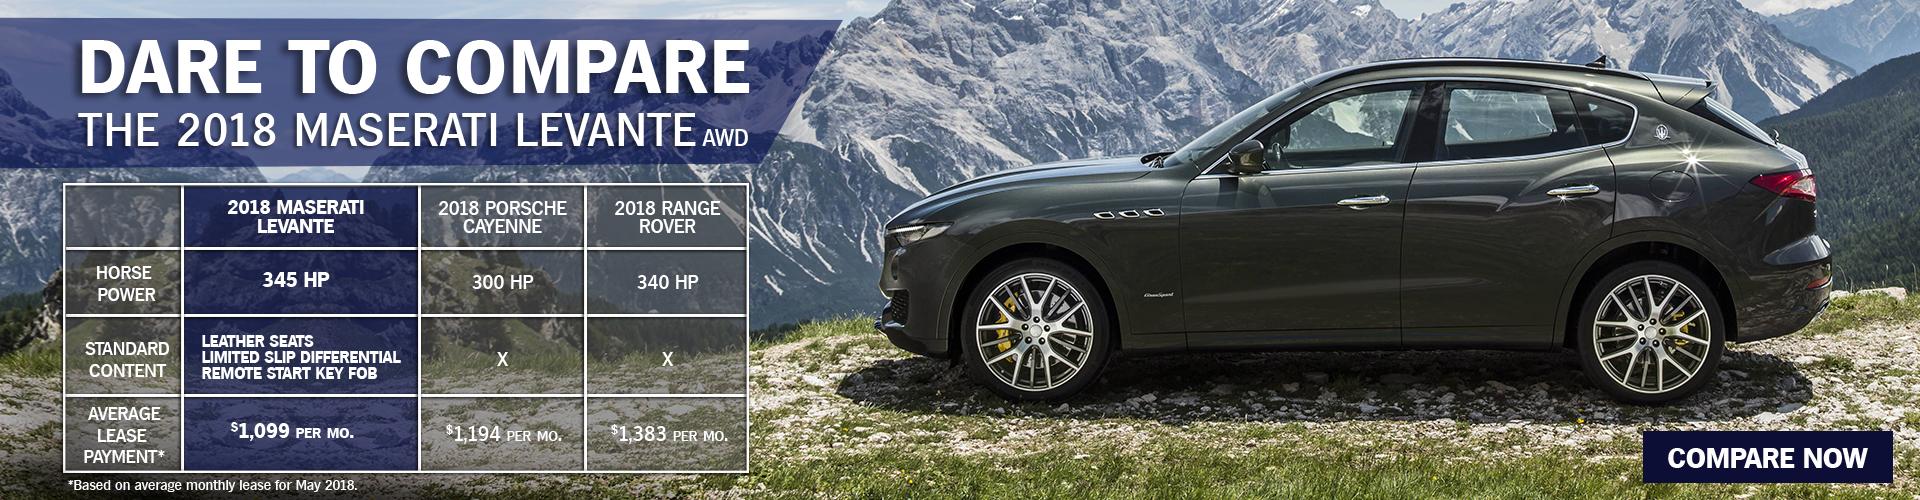 2018 Maserati Vs Top Competitors Maserati Van Nuys